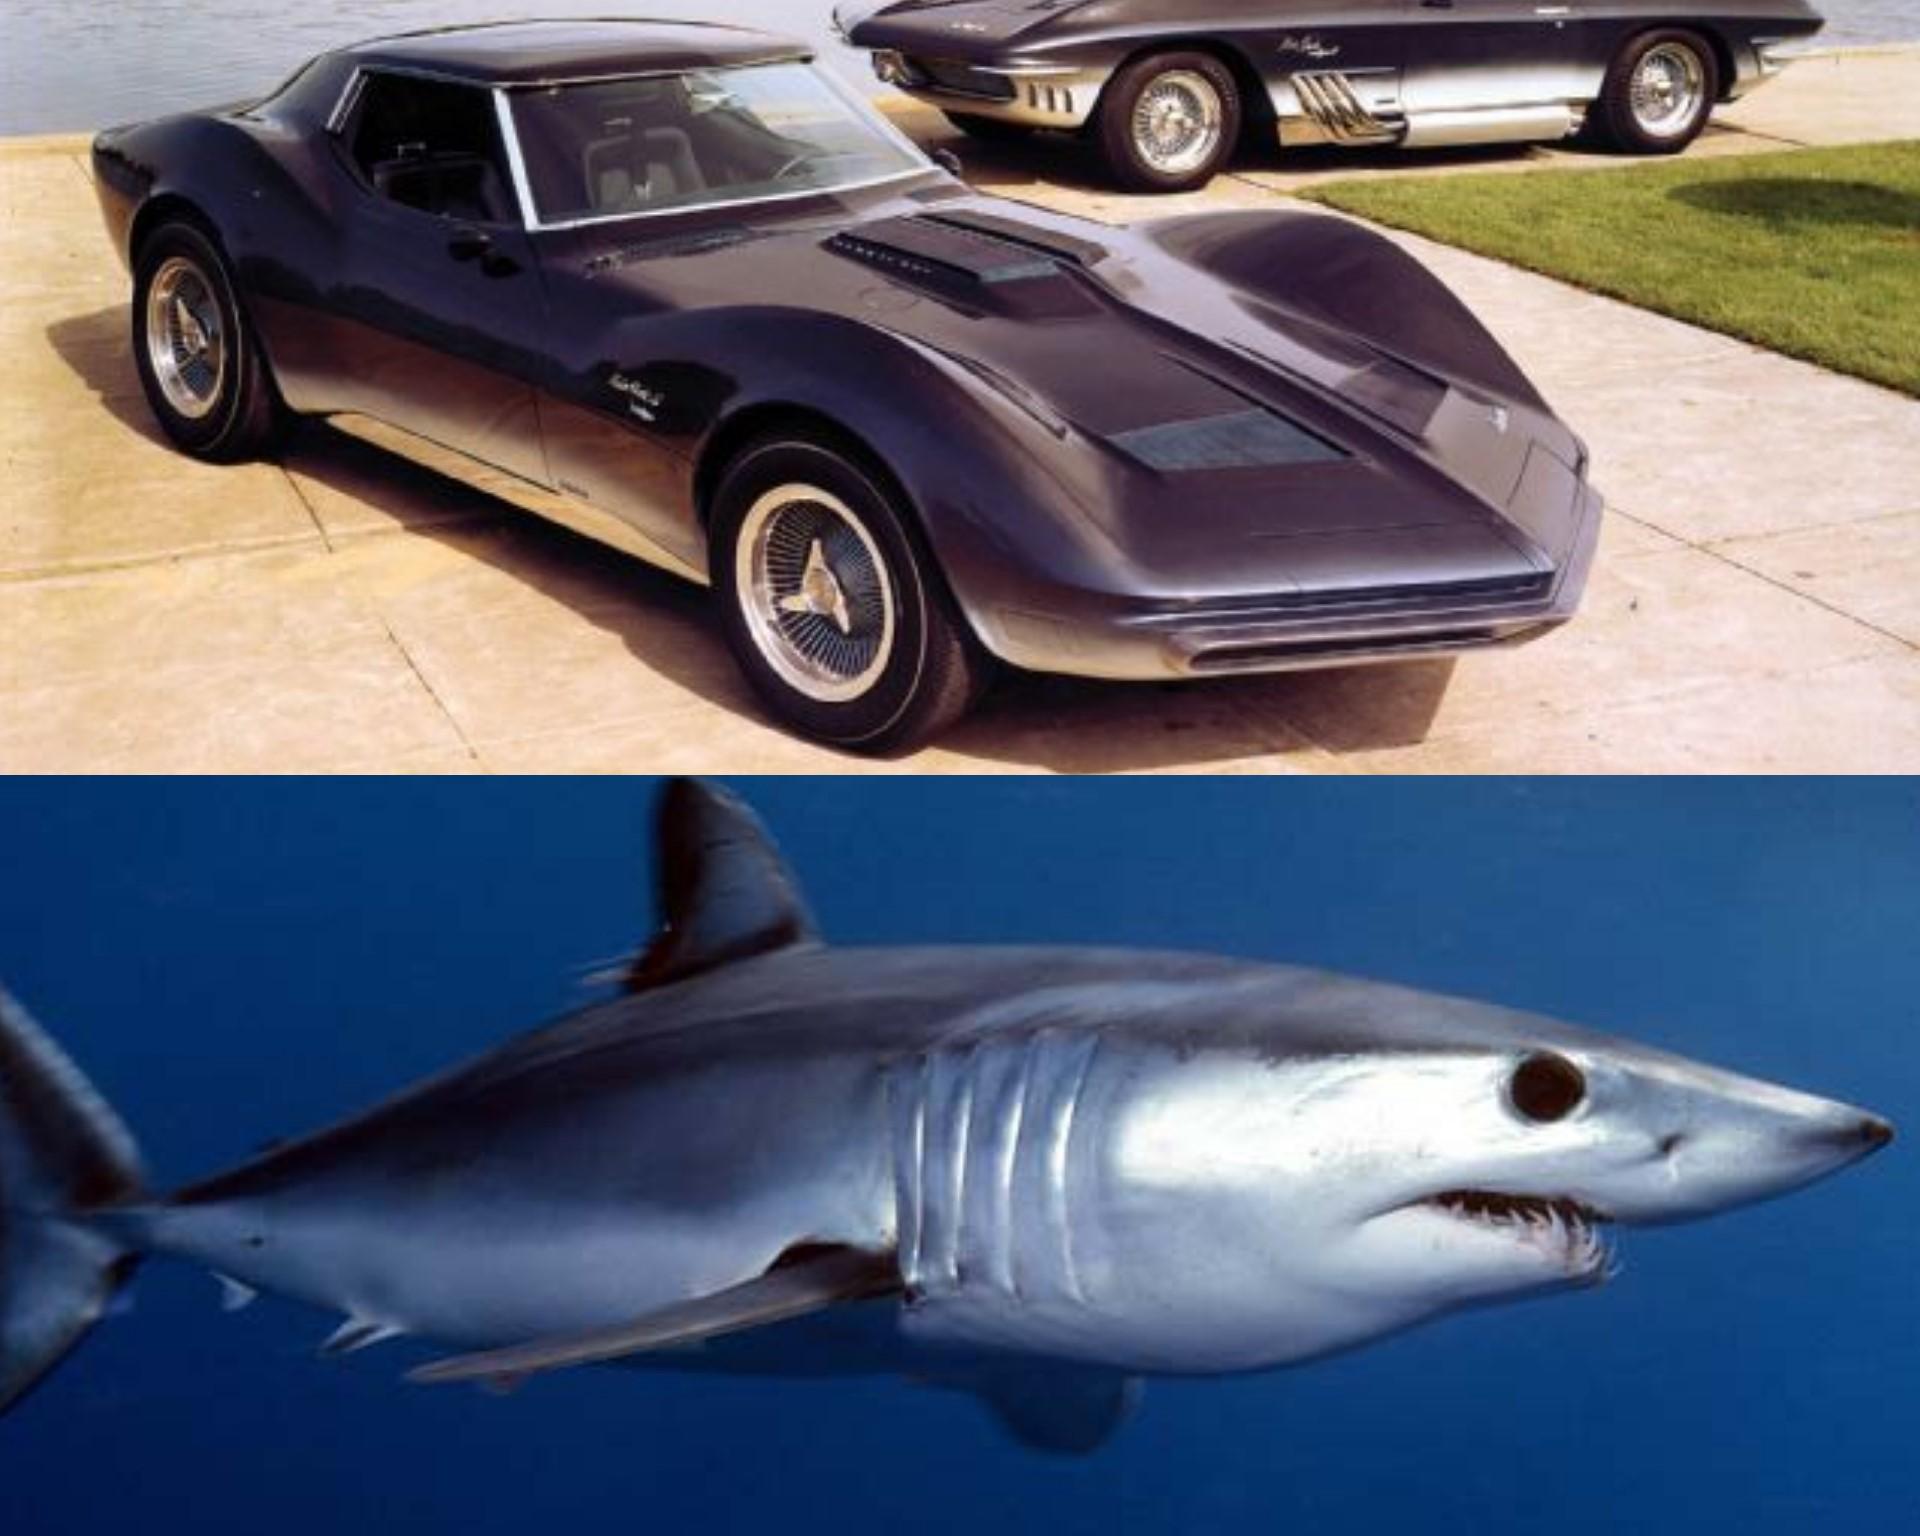 Corvette Mako Shark - Tiburón Mako